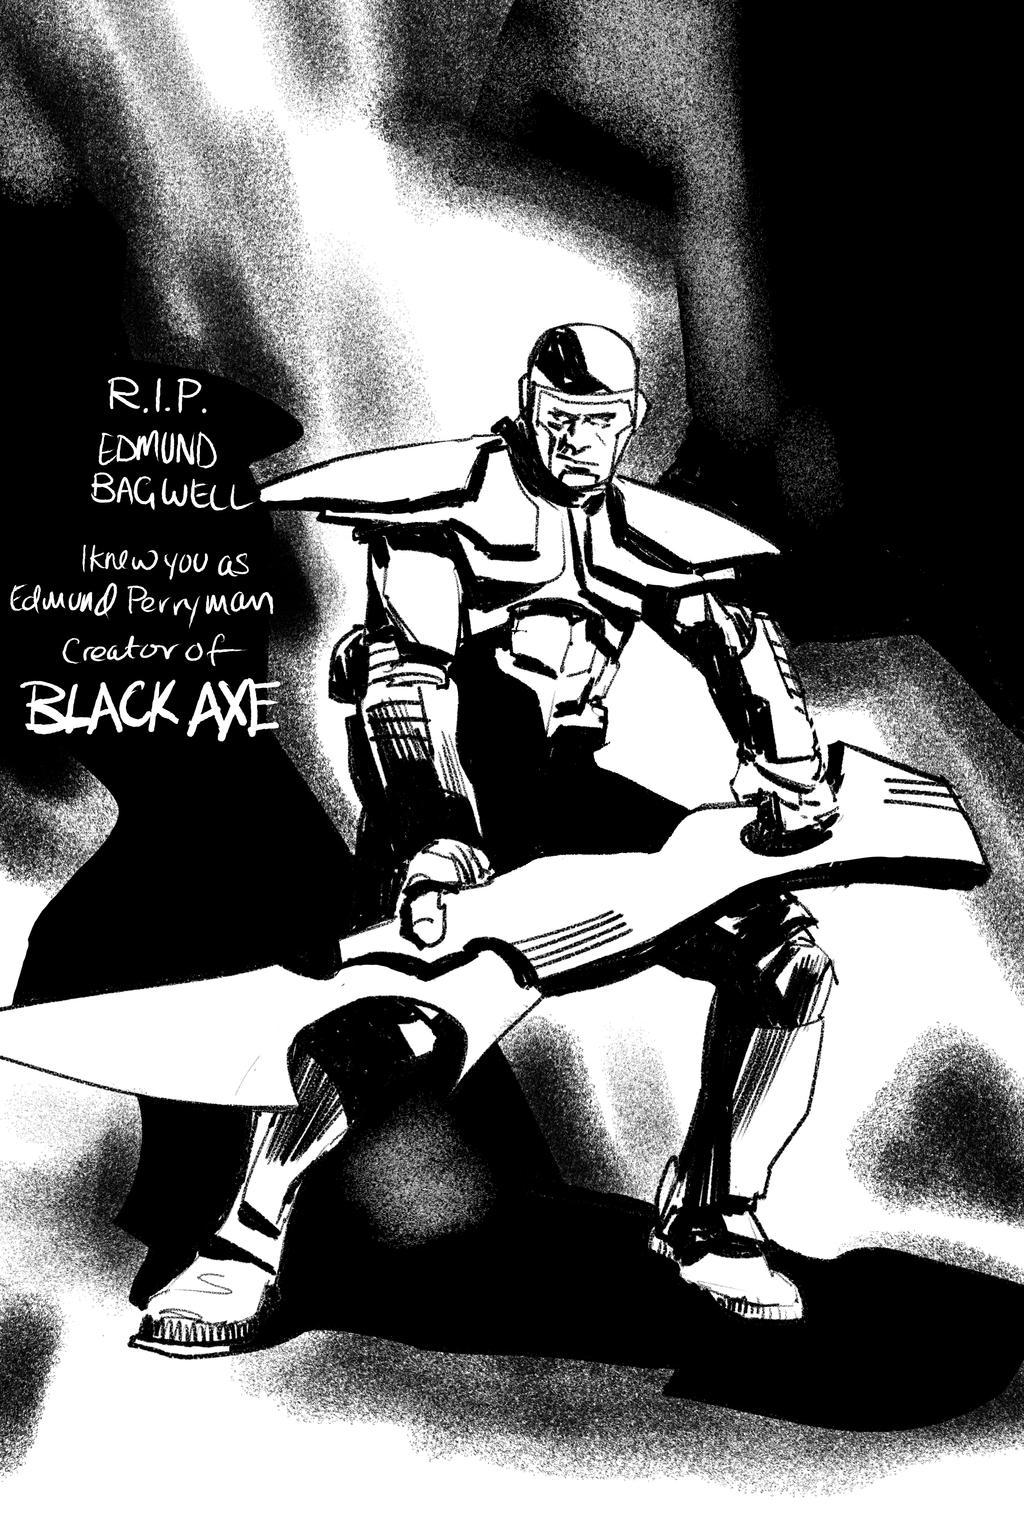 Blackaxe by Paul-Moore